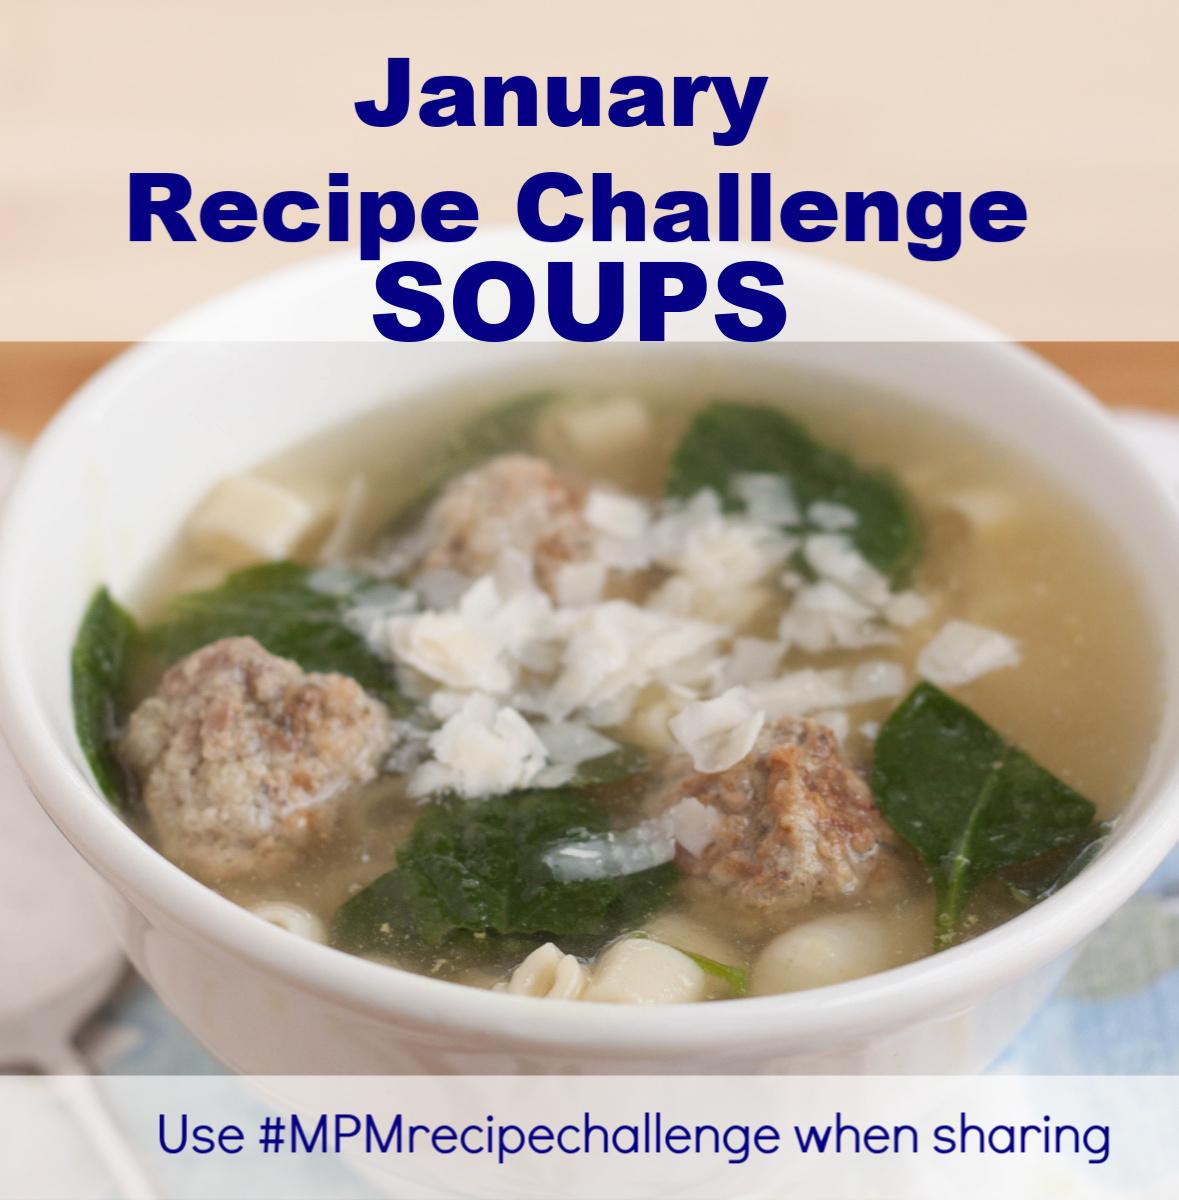 MPM Challenge - Jan 2018 image with words